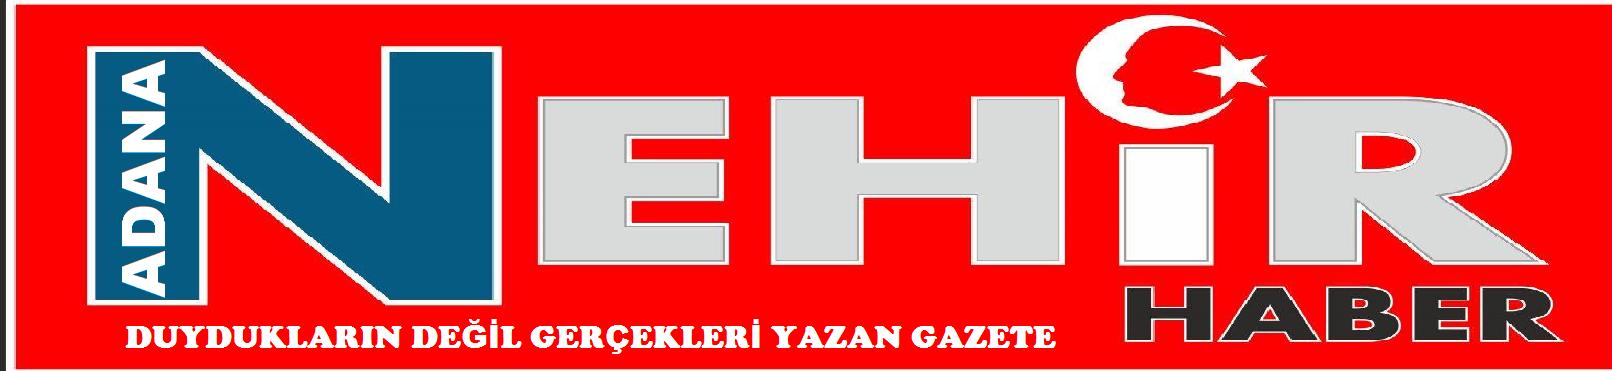 Ceyhan Nehir Haber